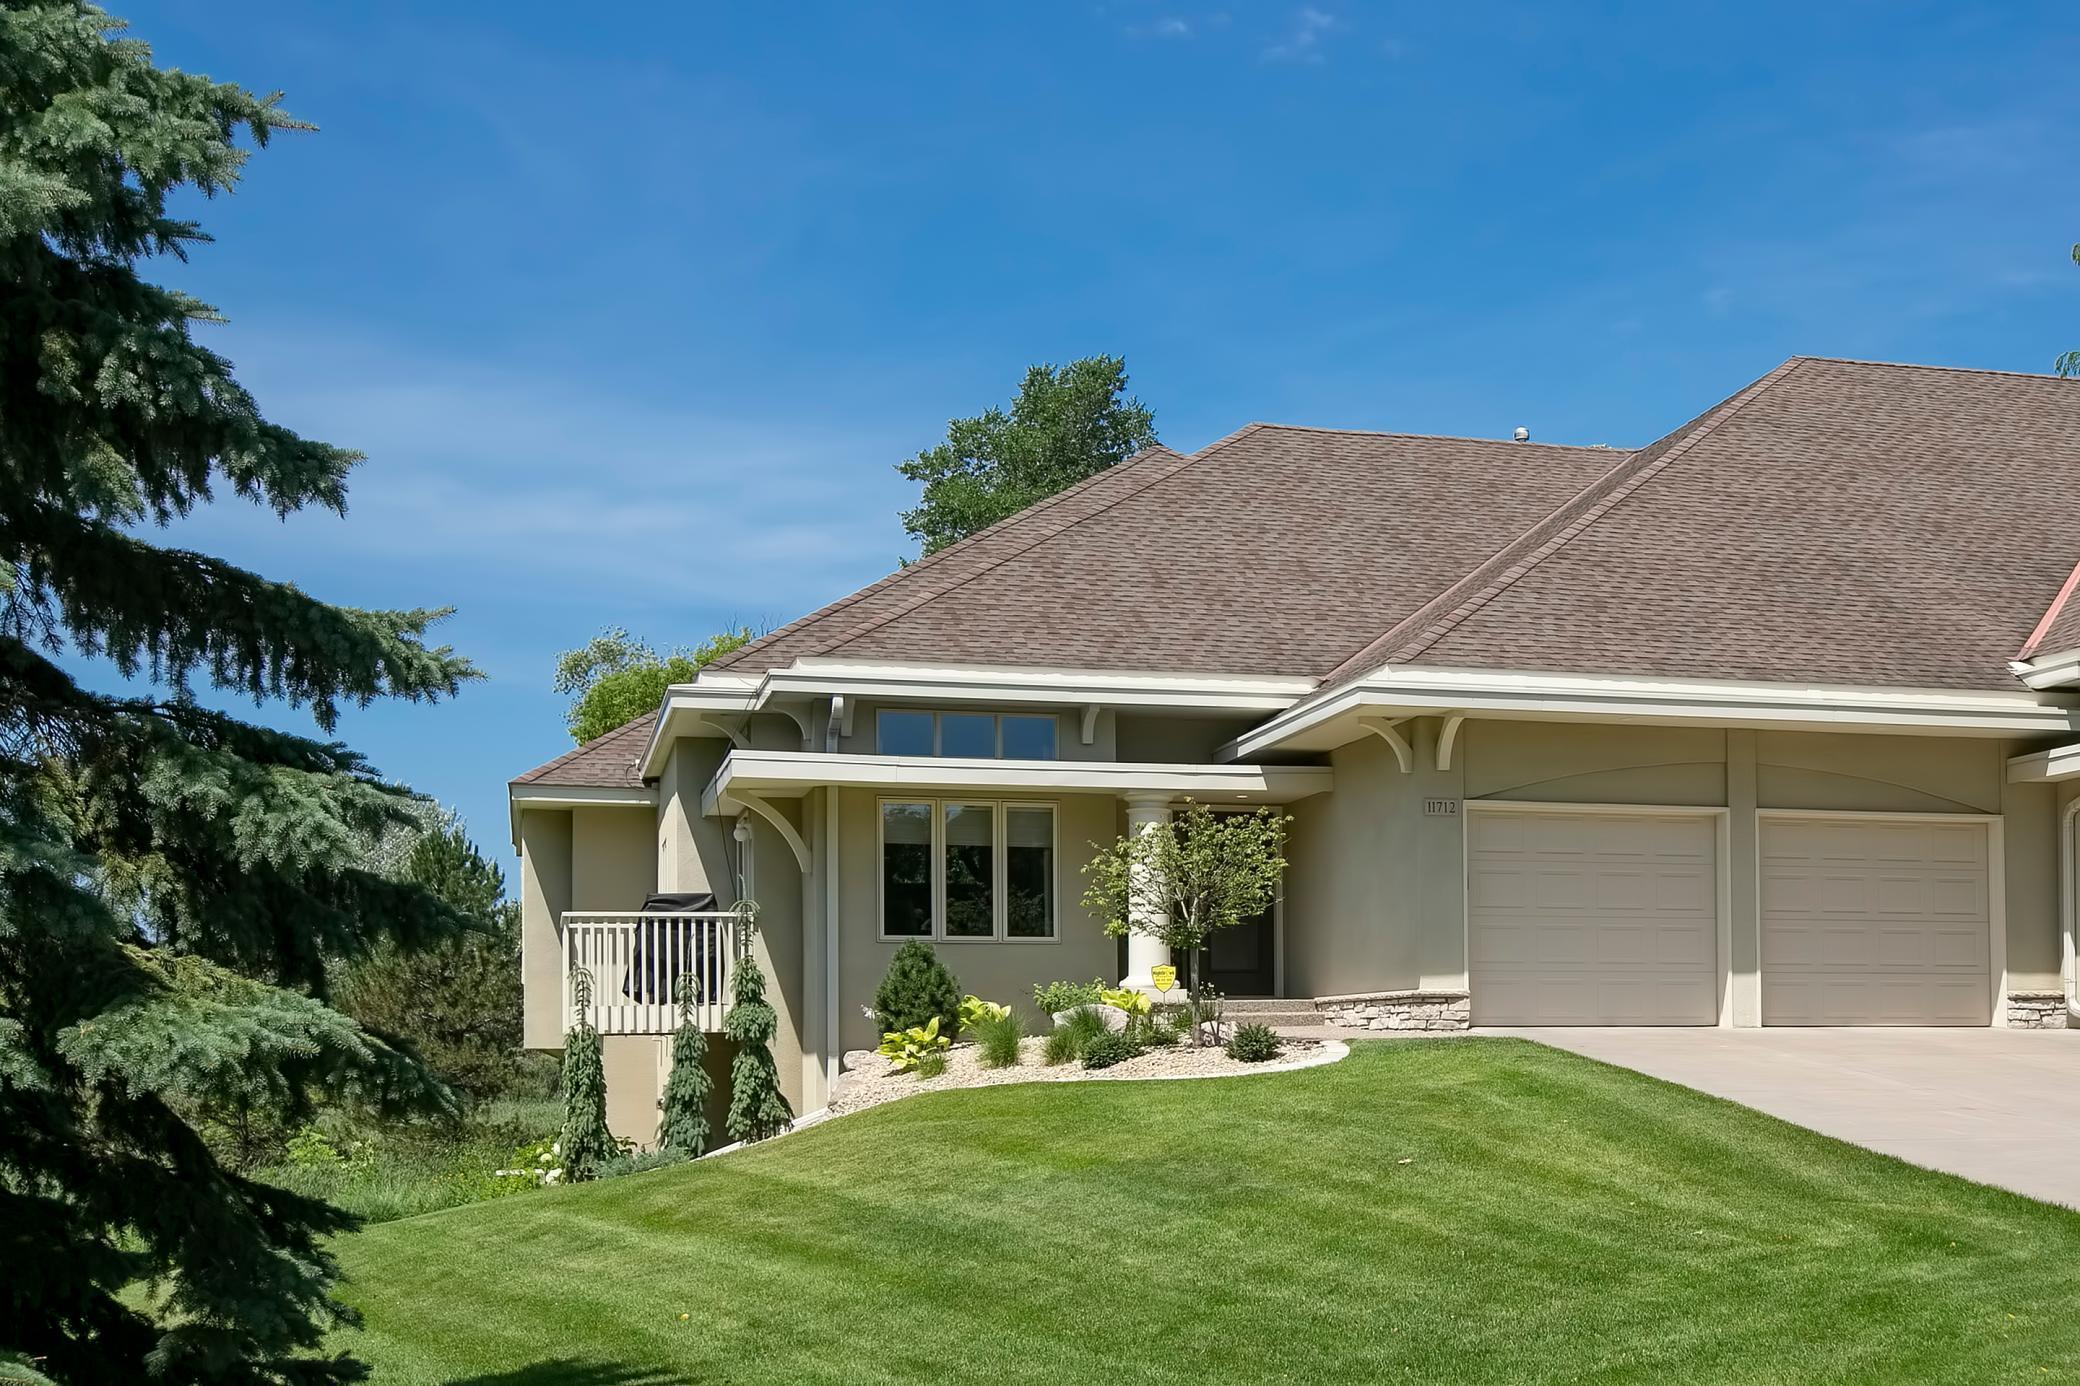 11712 Foxhall Property Photo - Minnetonka, MN real estate listing